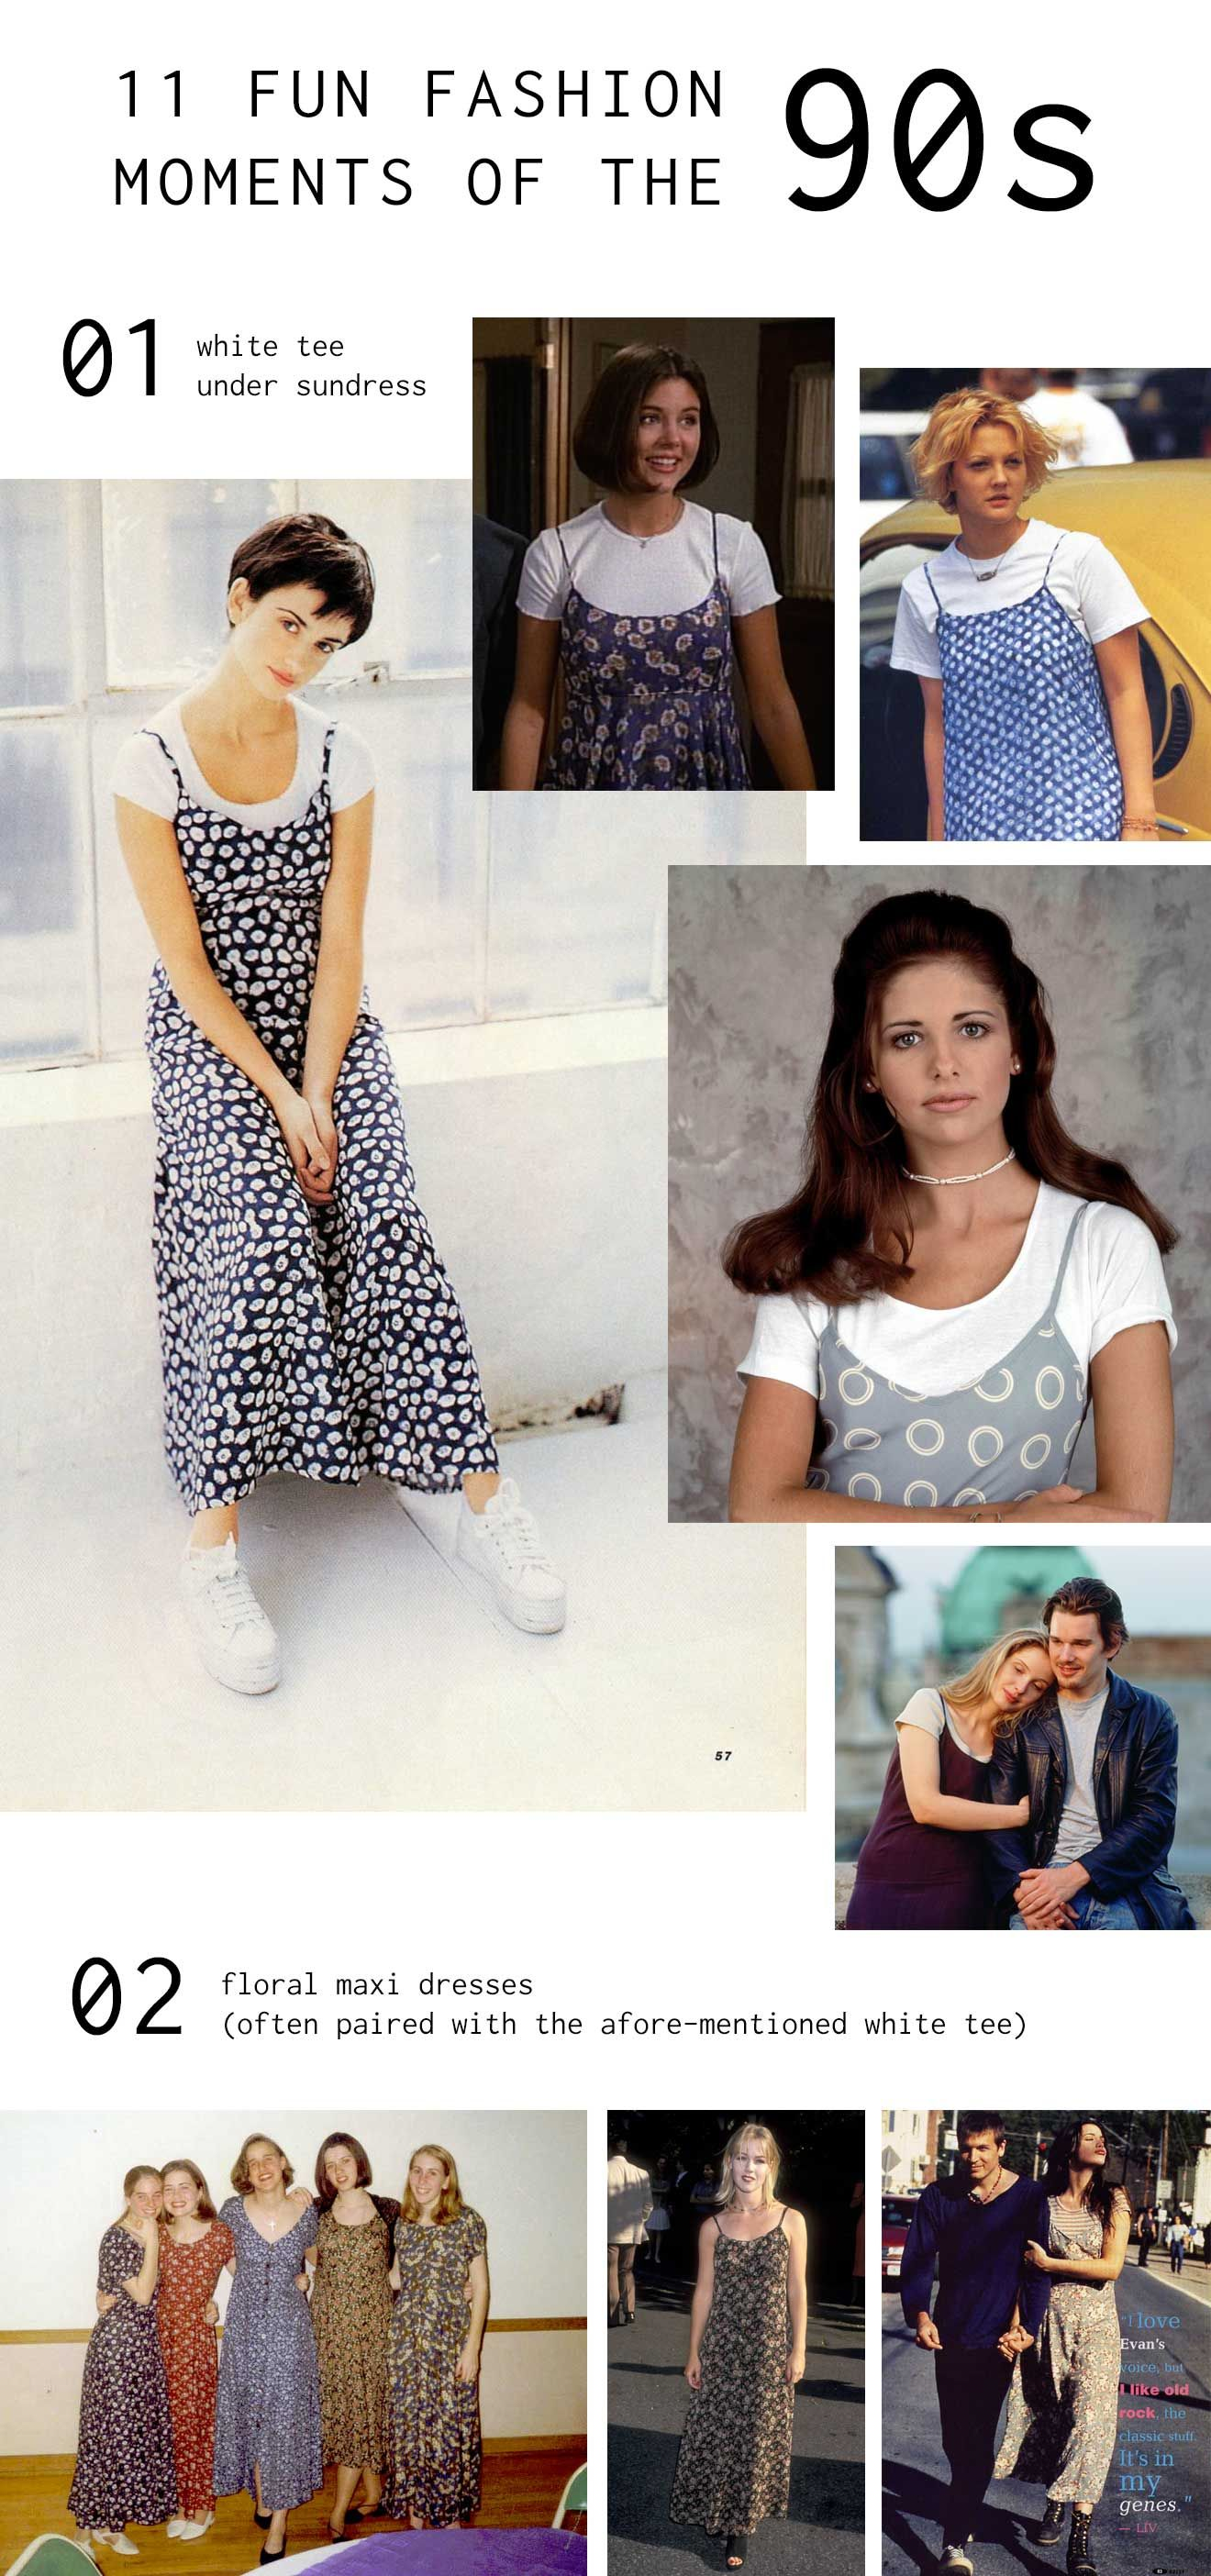 age 7 maxi dress 90s